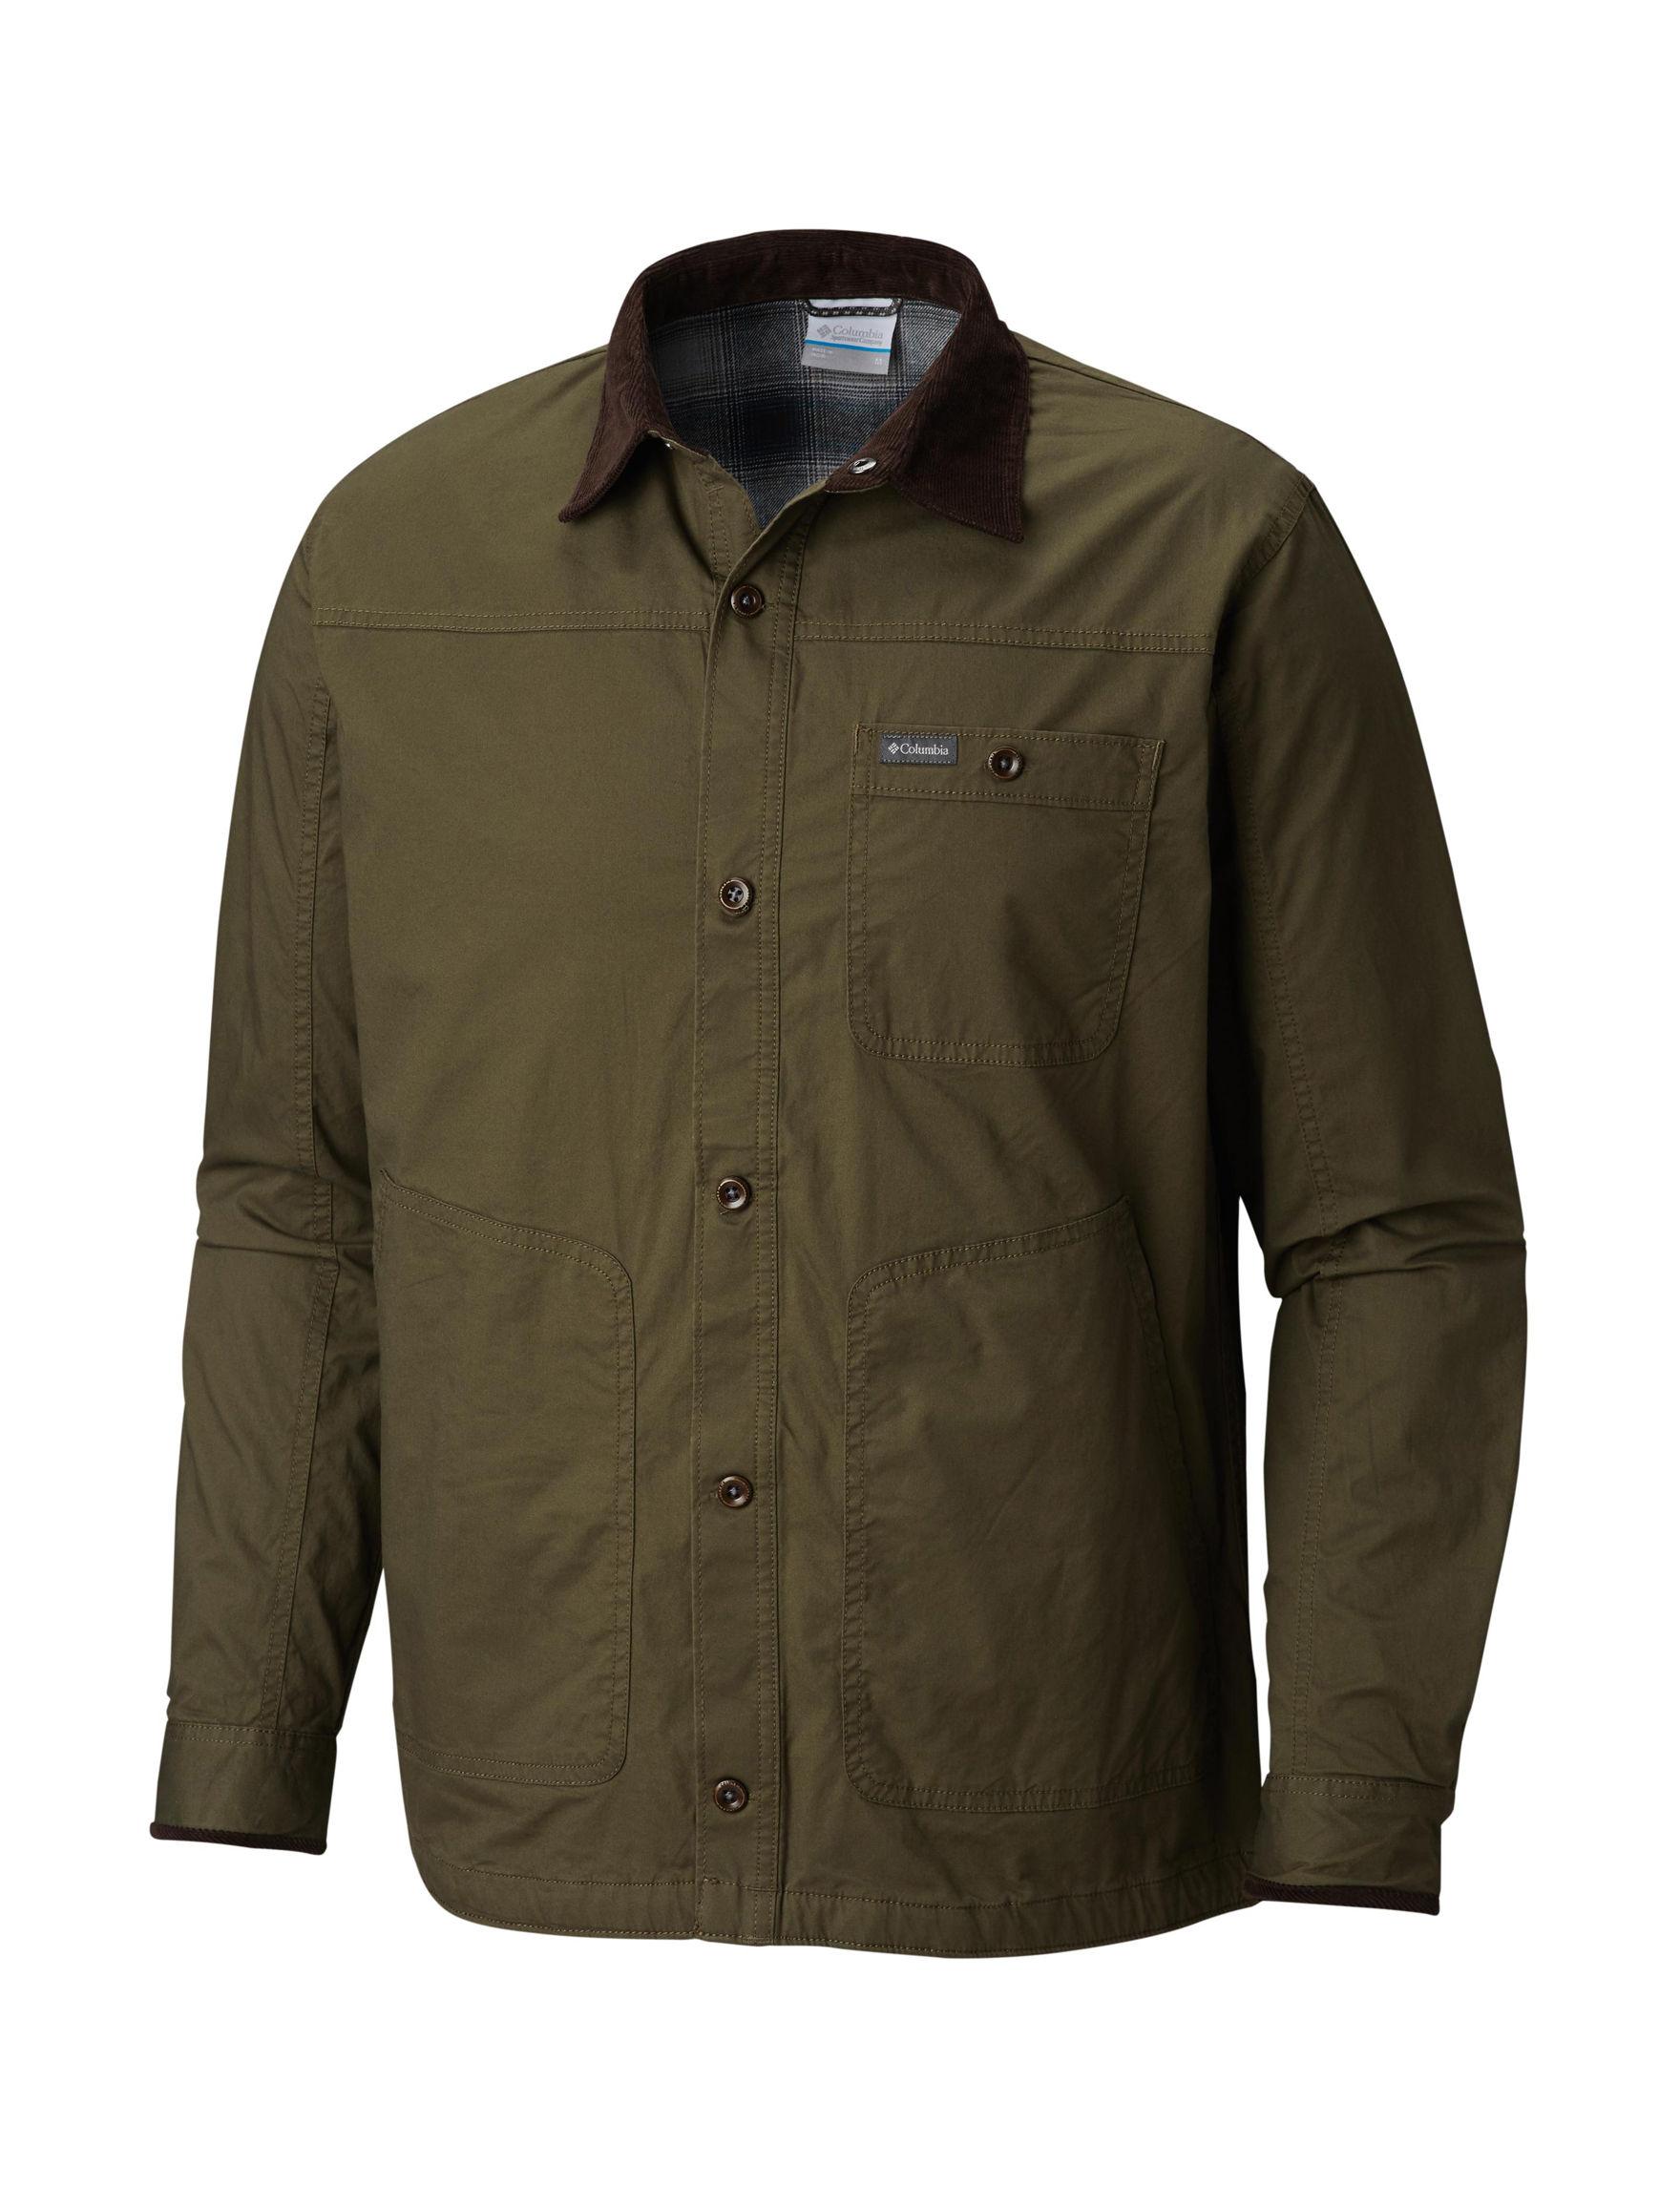 Columbia Brown Lightweight Jackets & Blazers